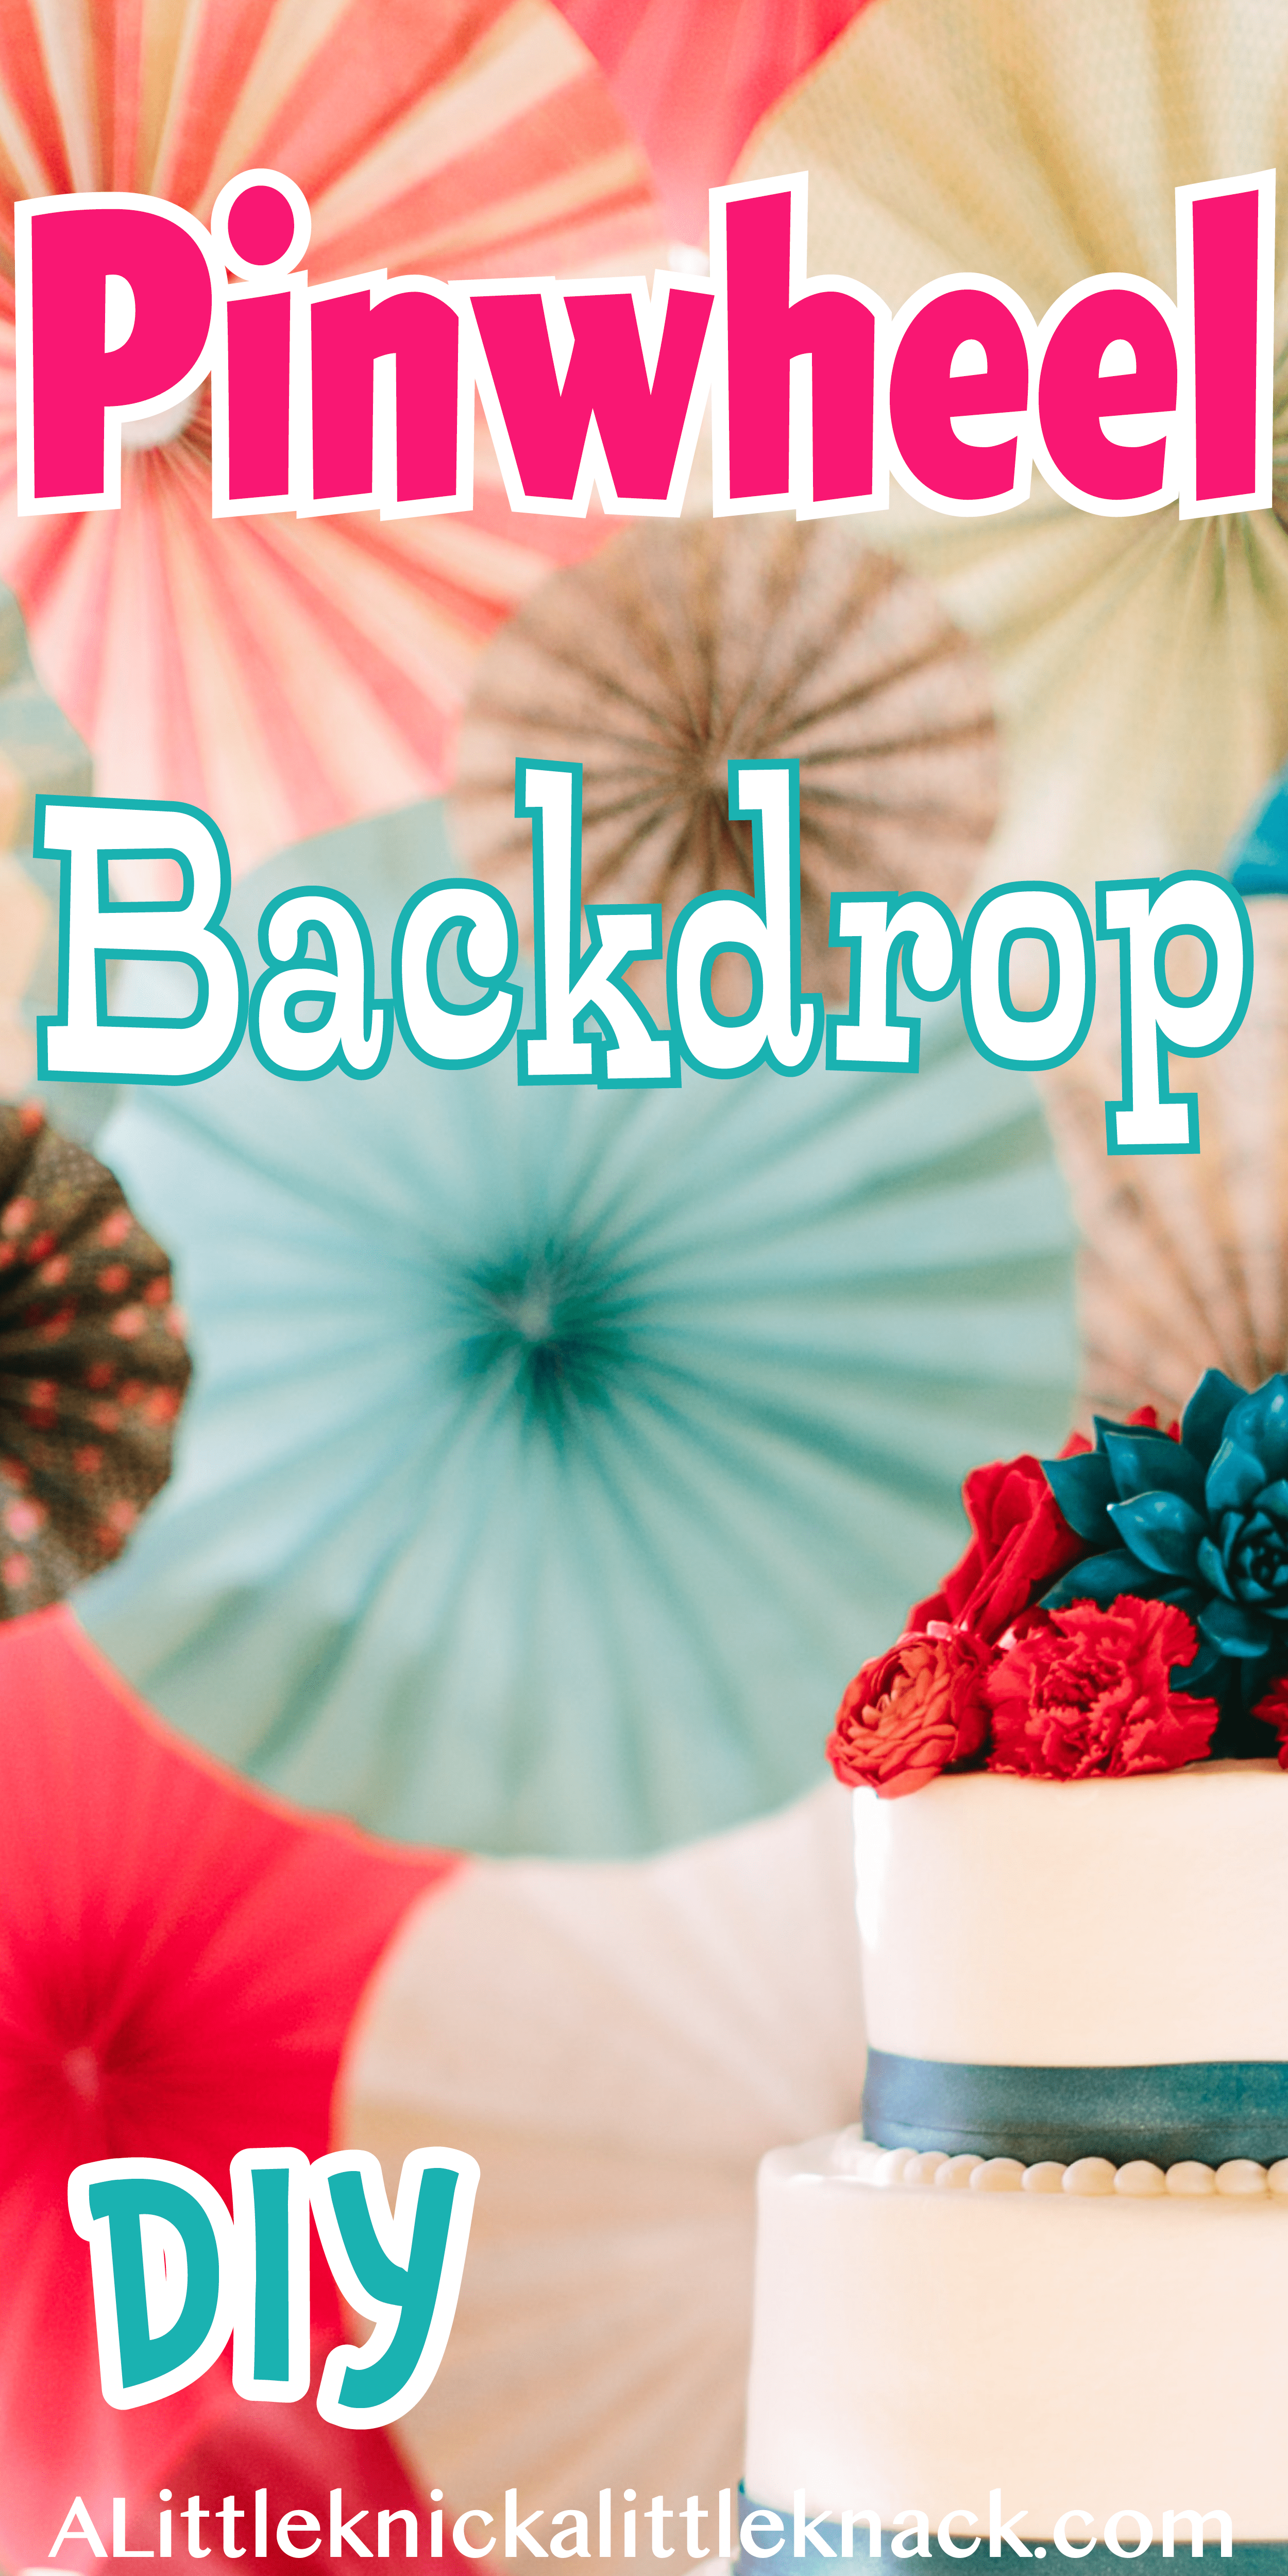 DIY Pinwheel Backdrop | Diy pinwheel, Romantic wedding ...